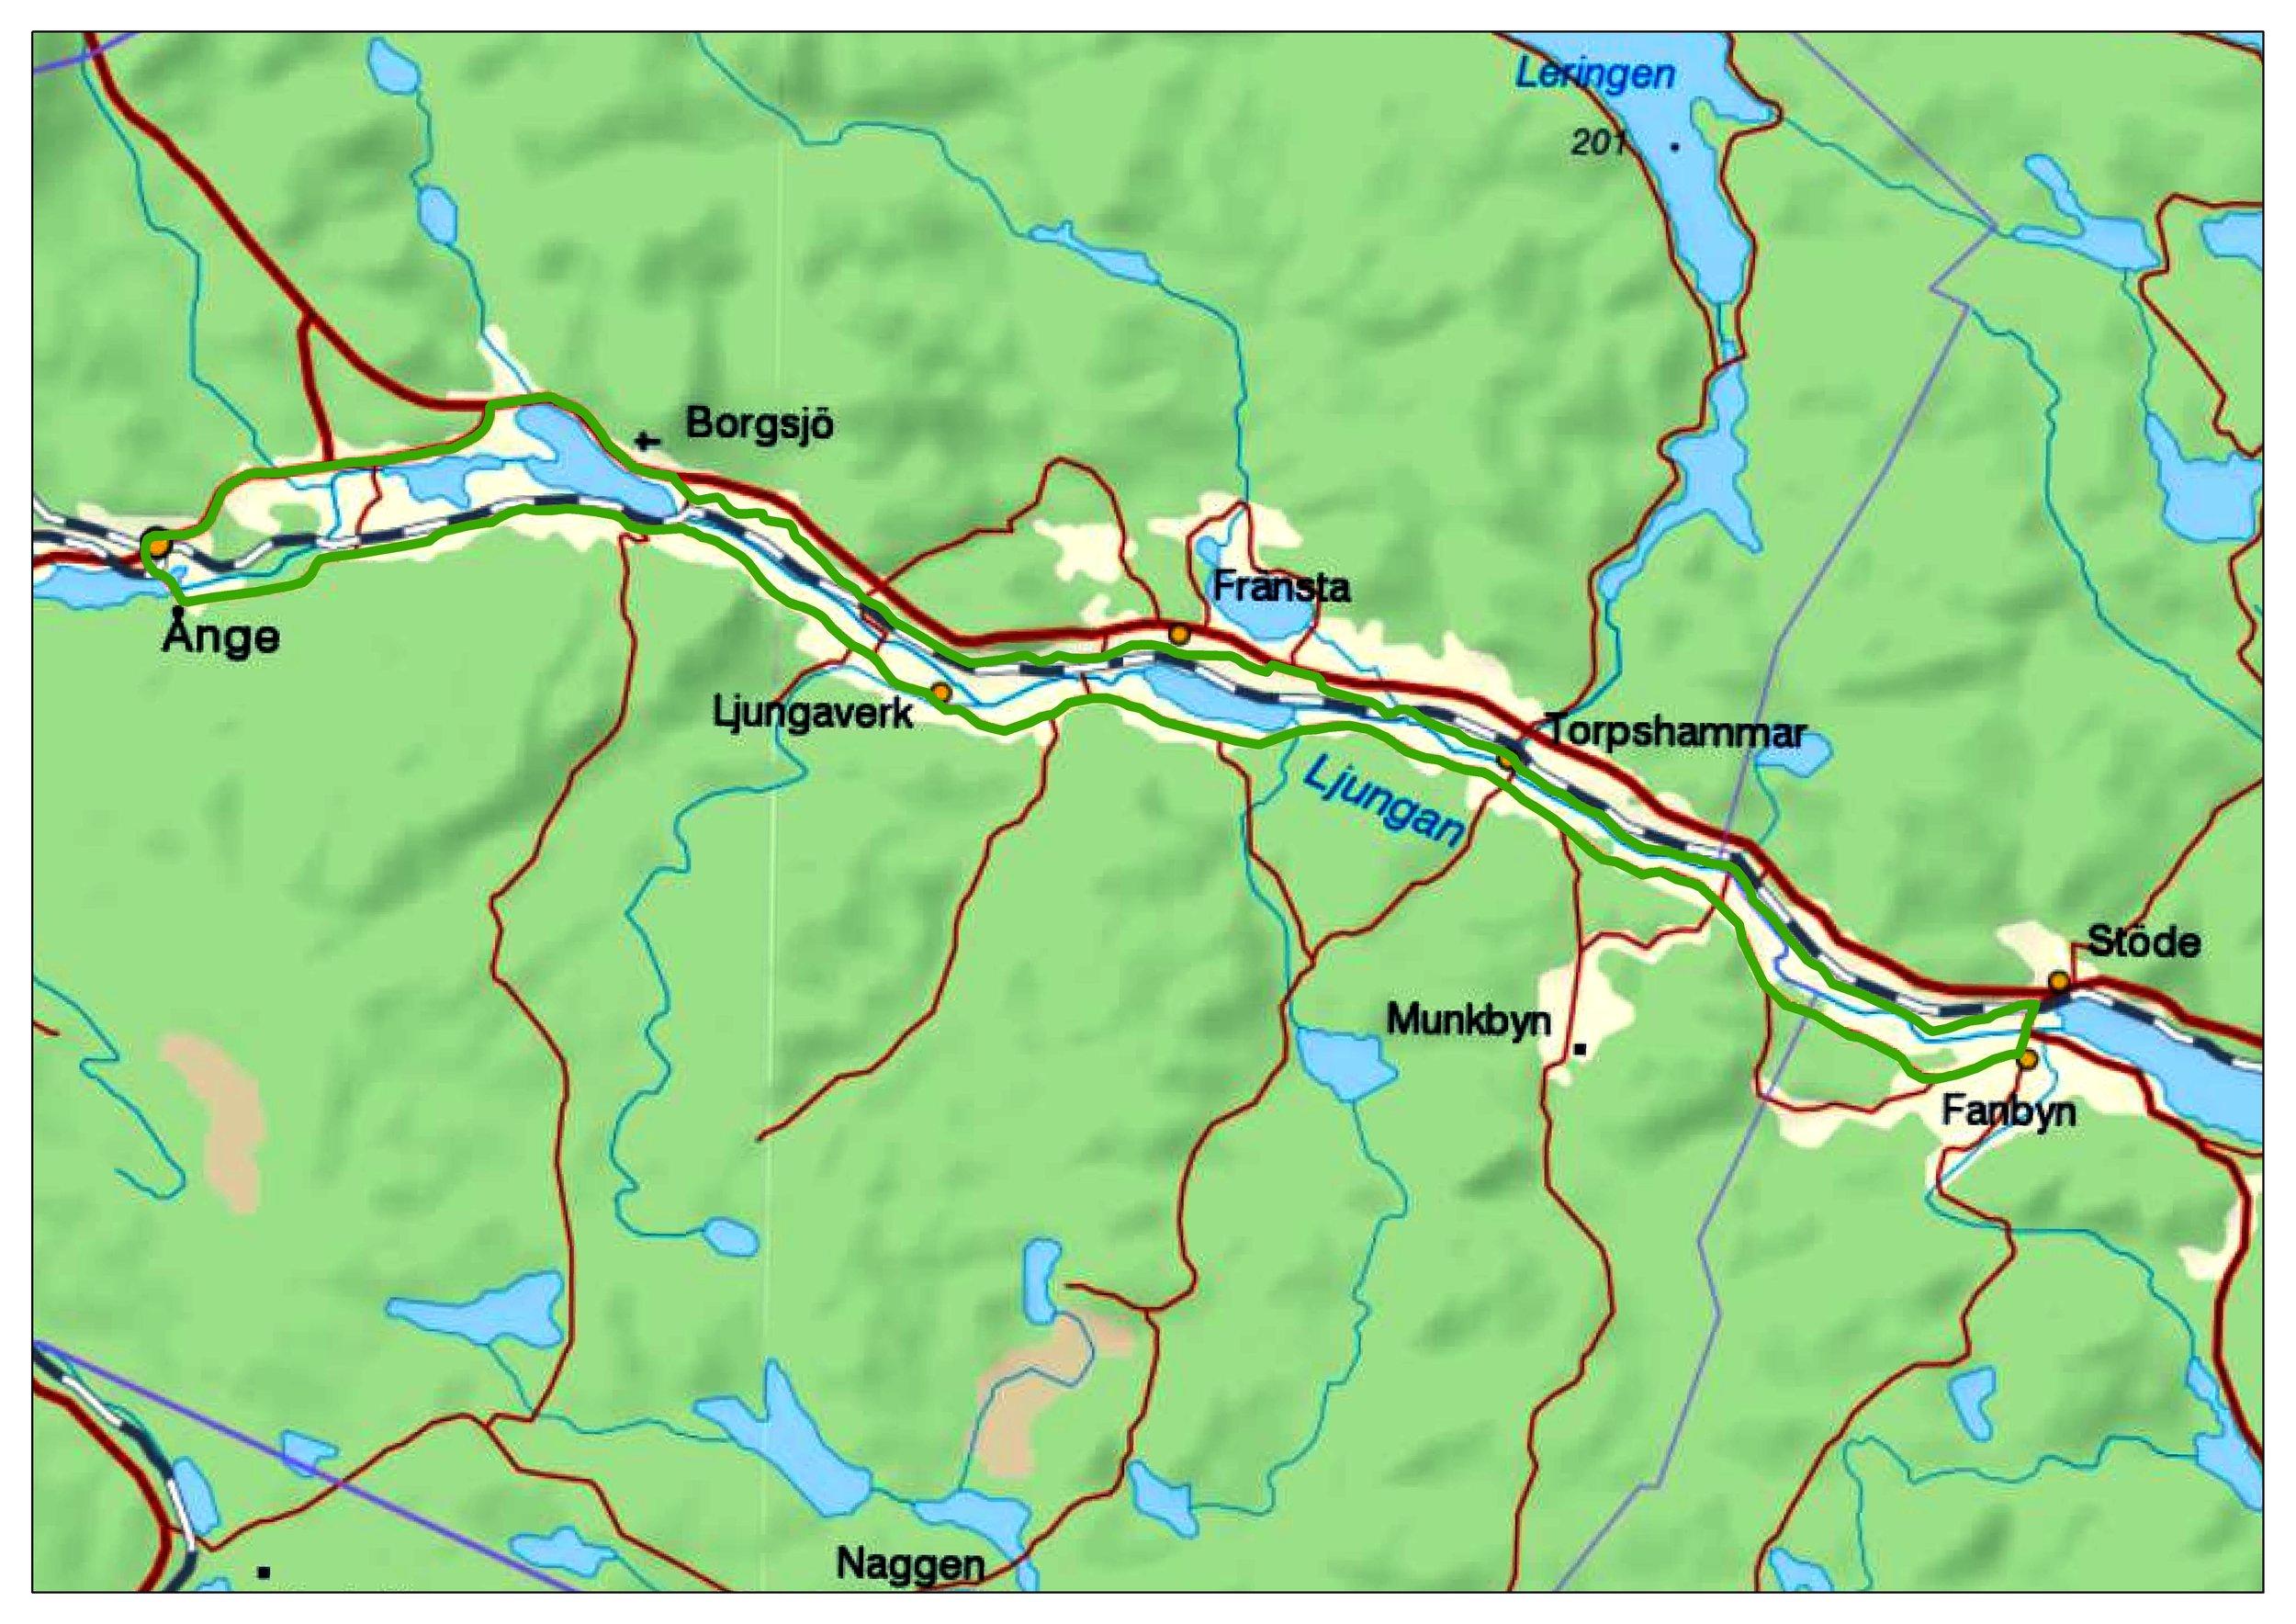 Cykelkarta1 (2).jpg